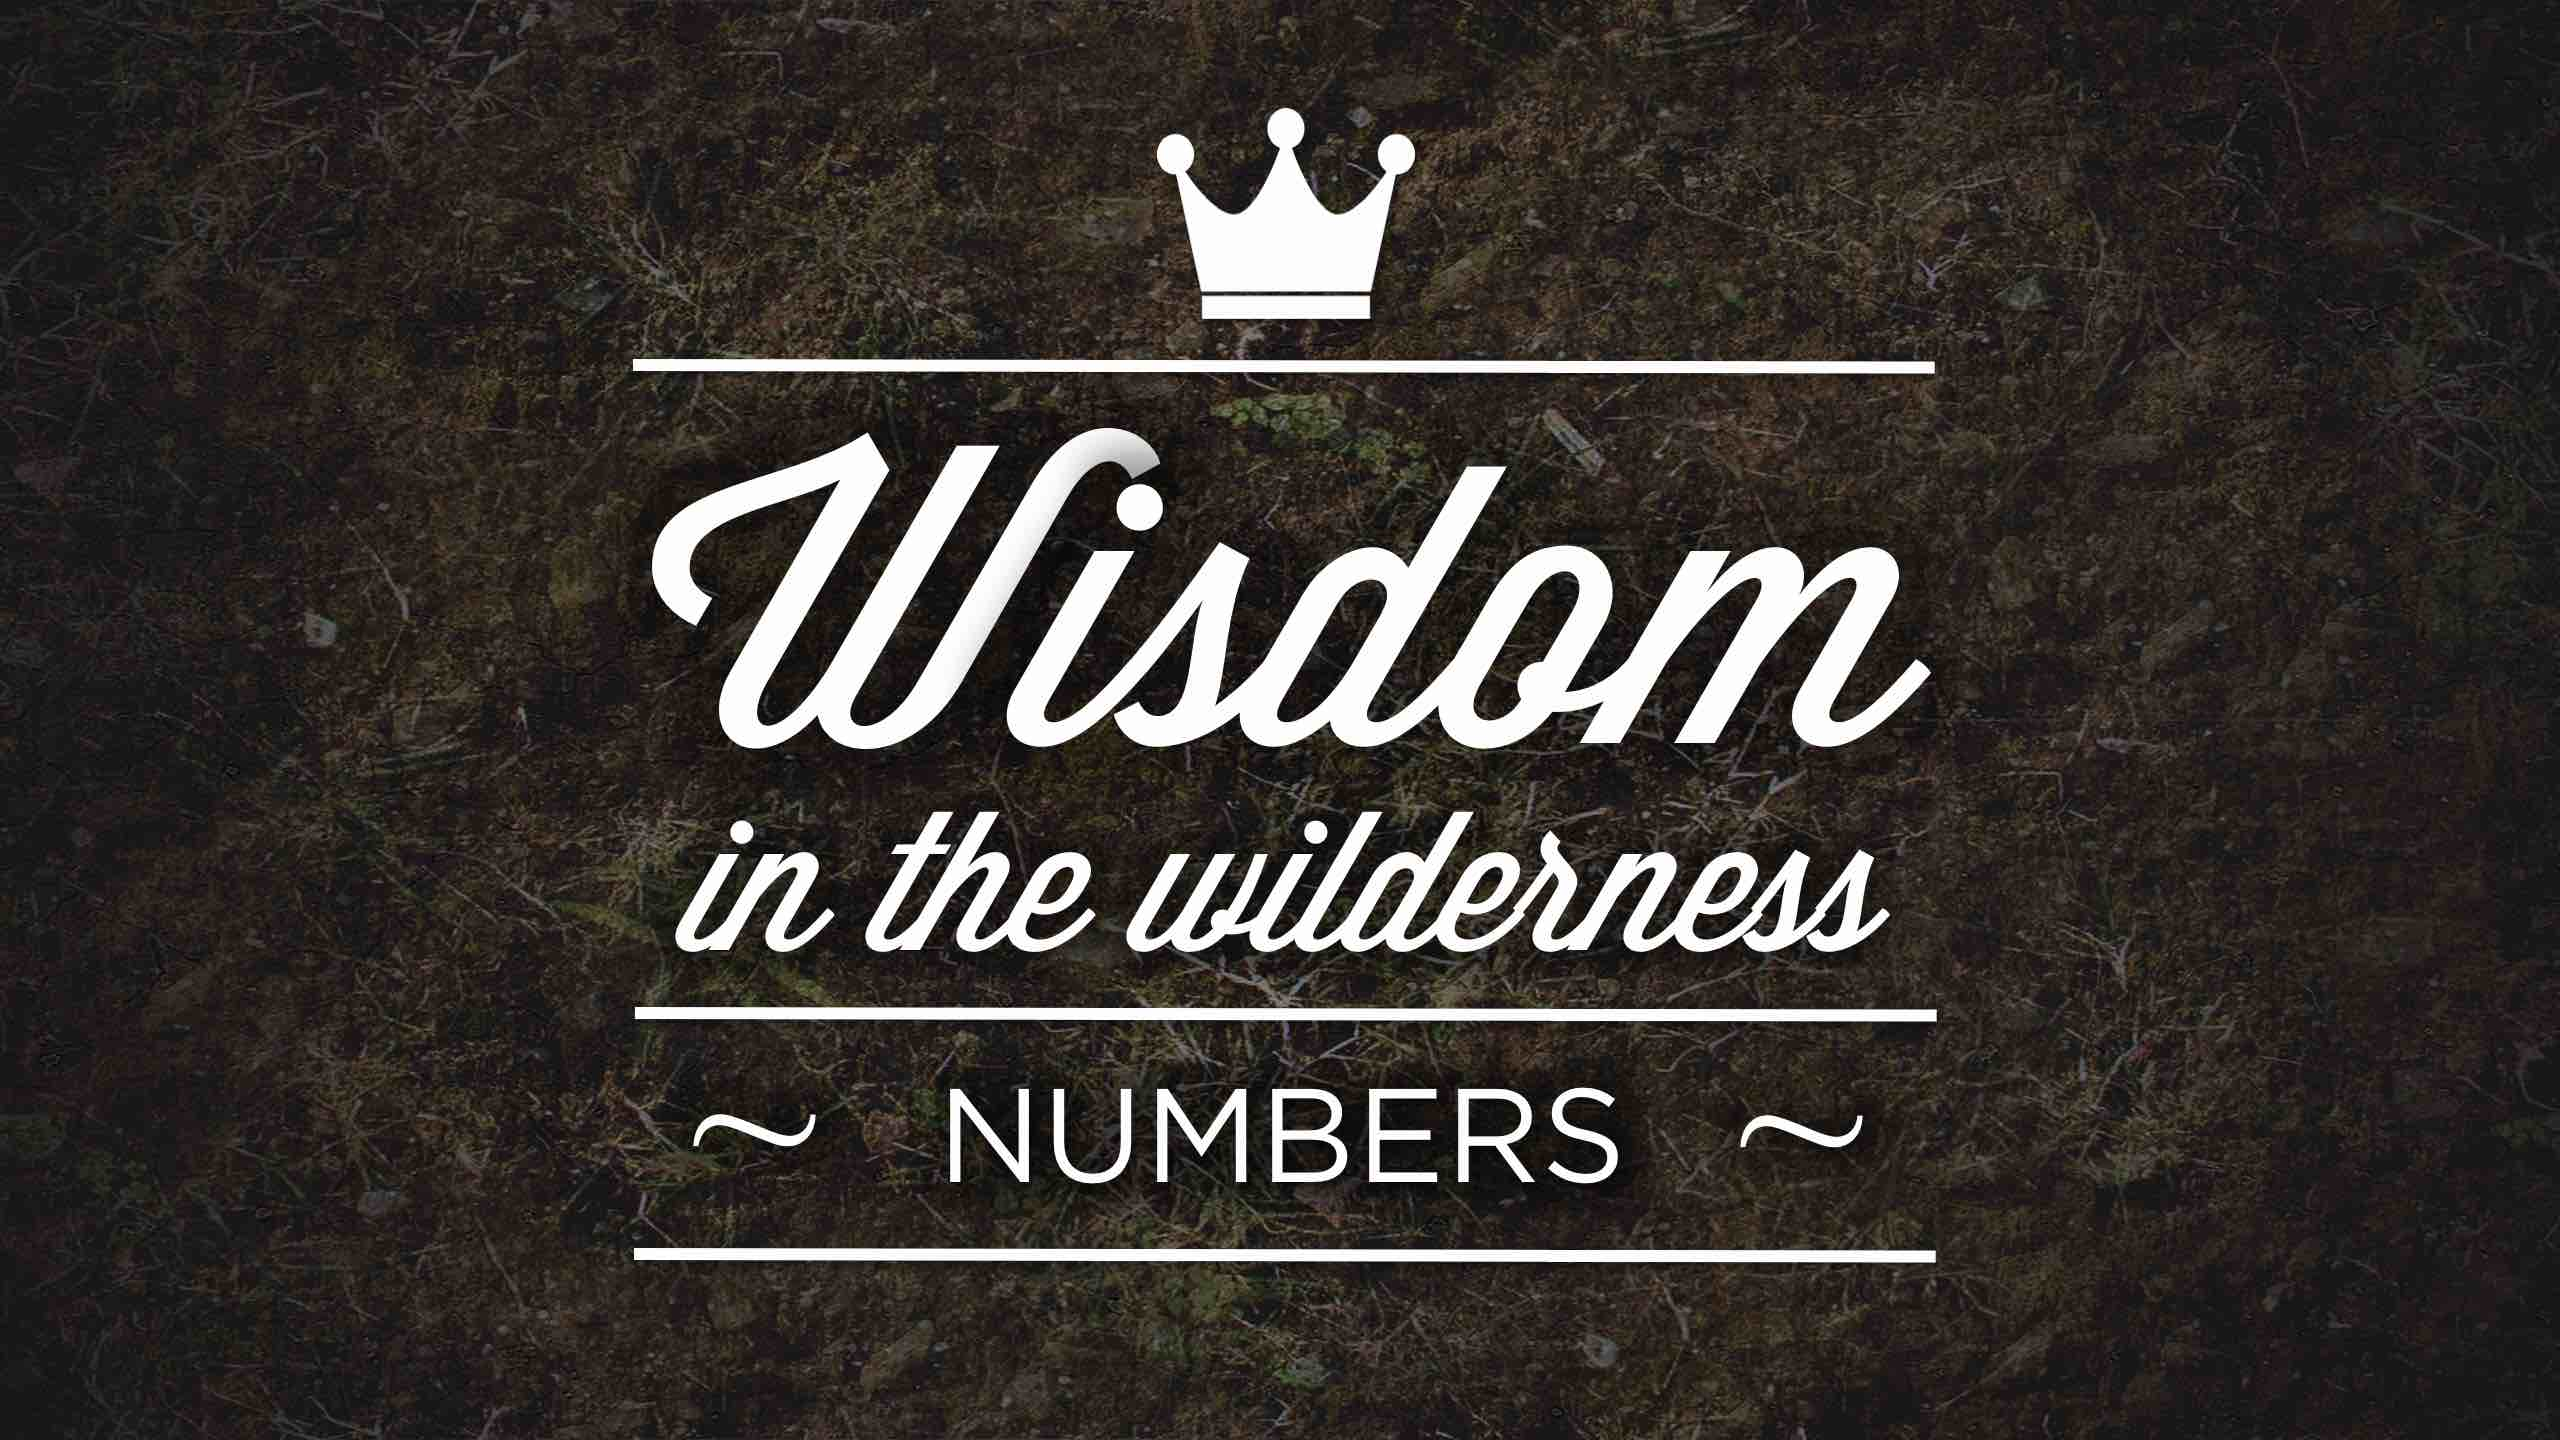 Wisdom in The Wilderness